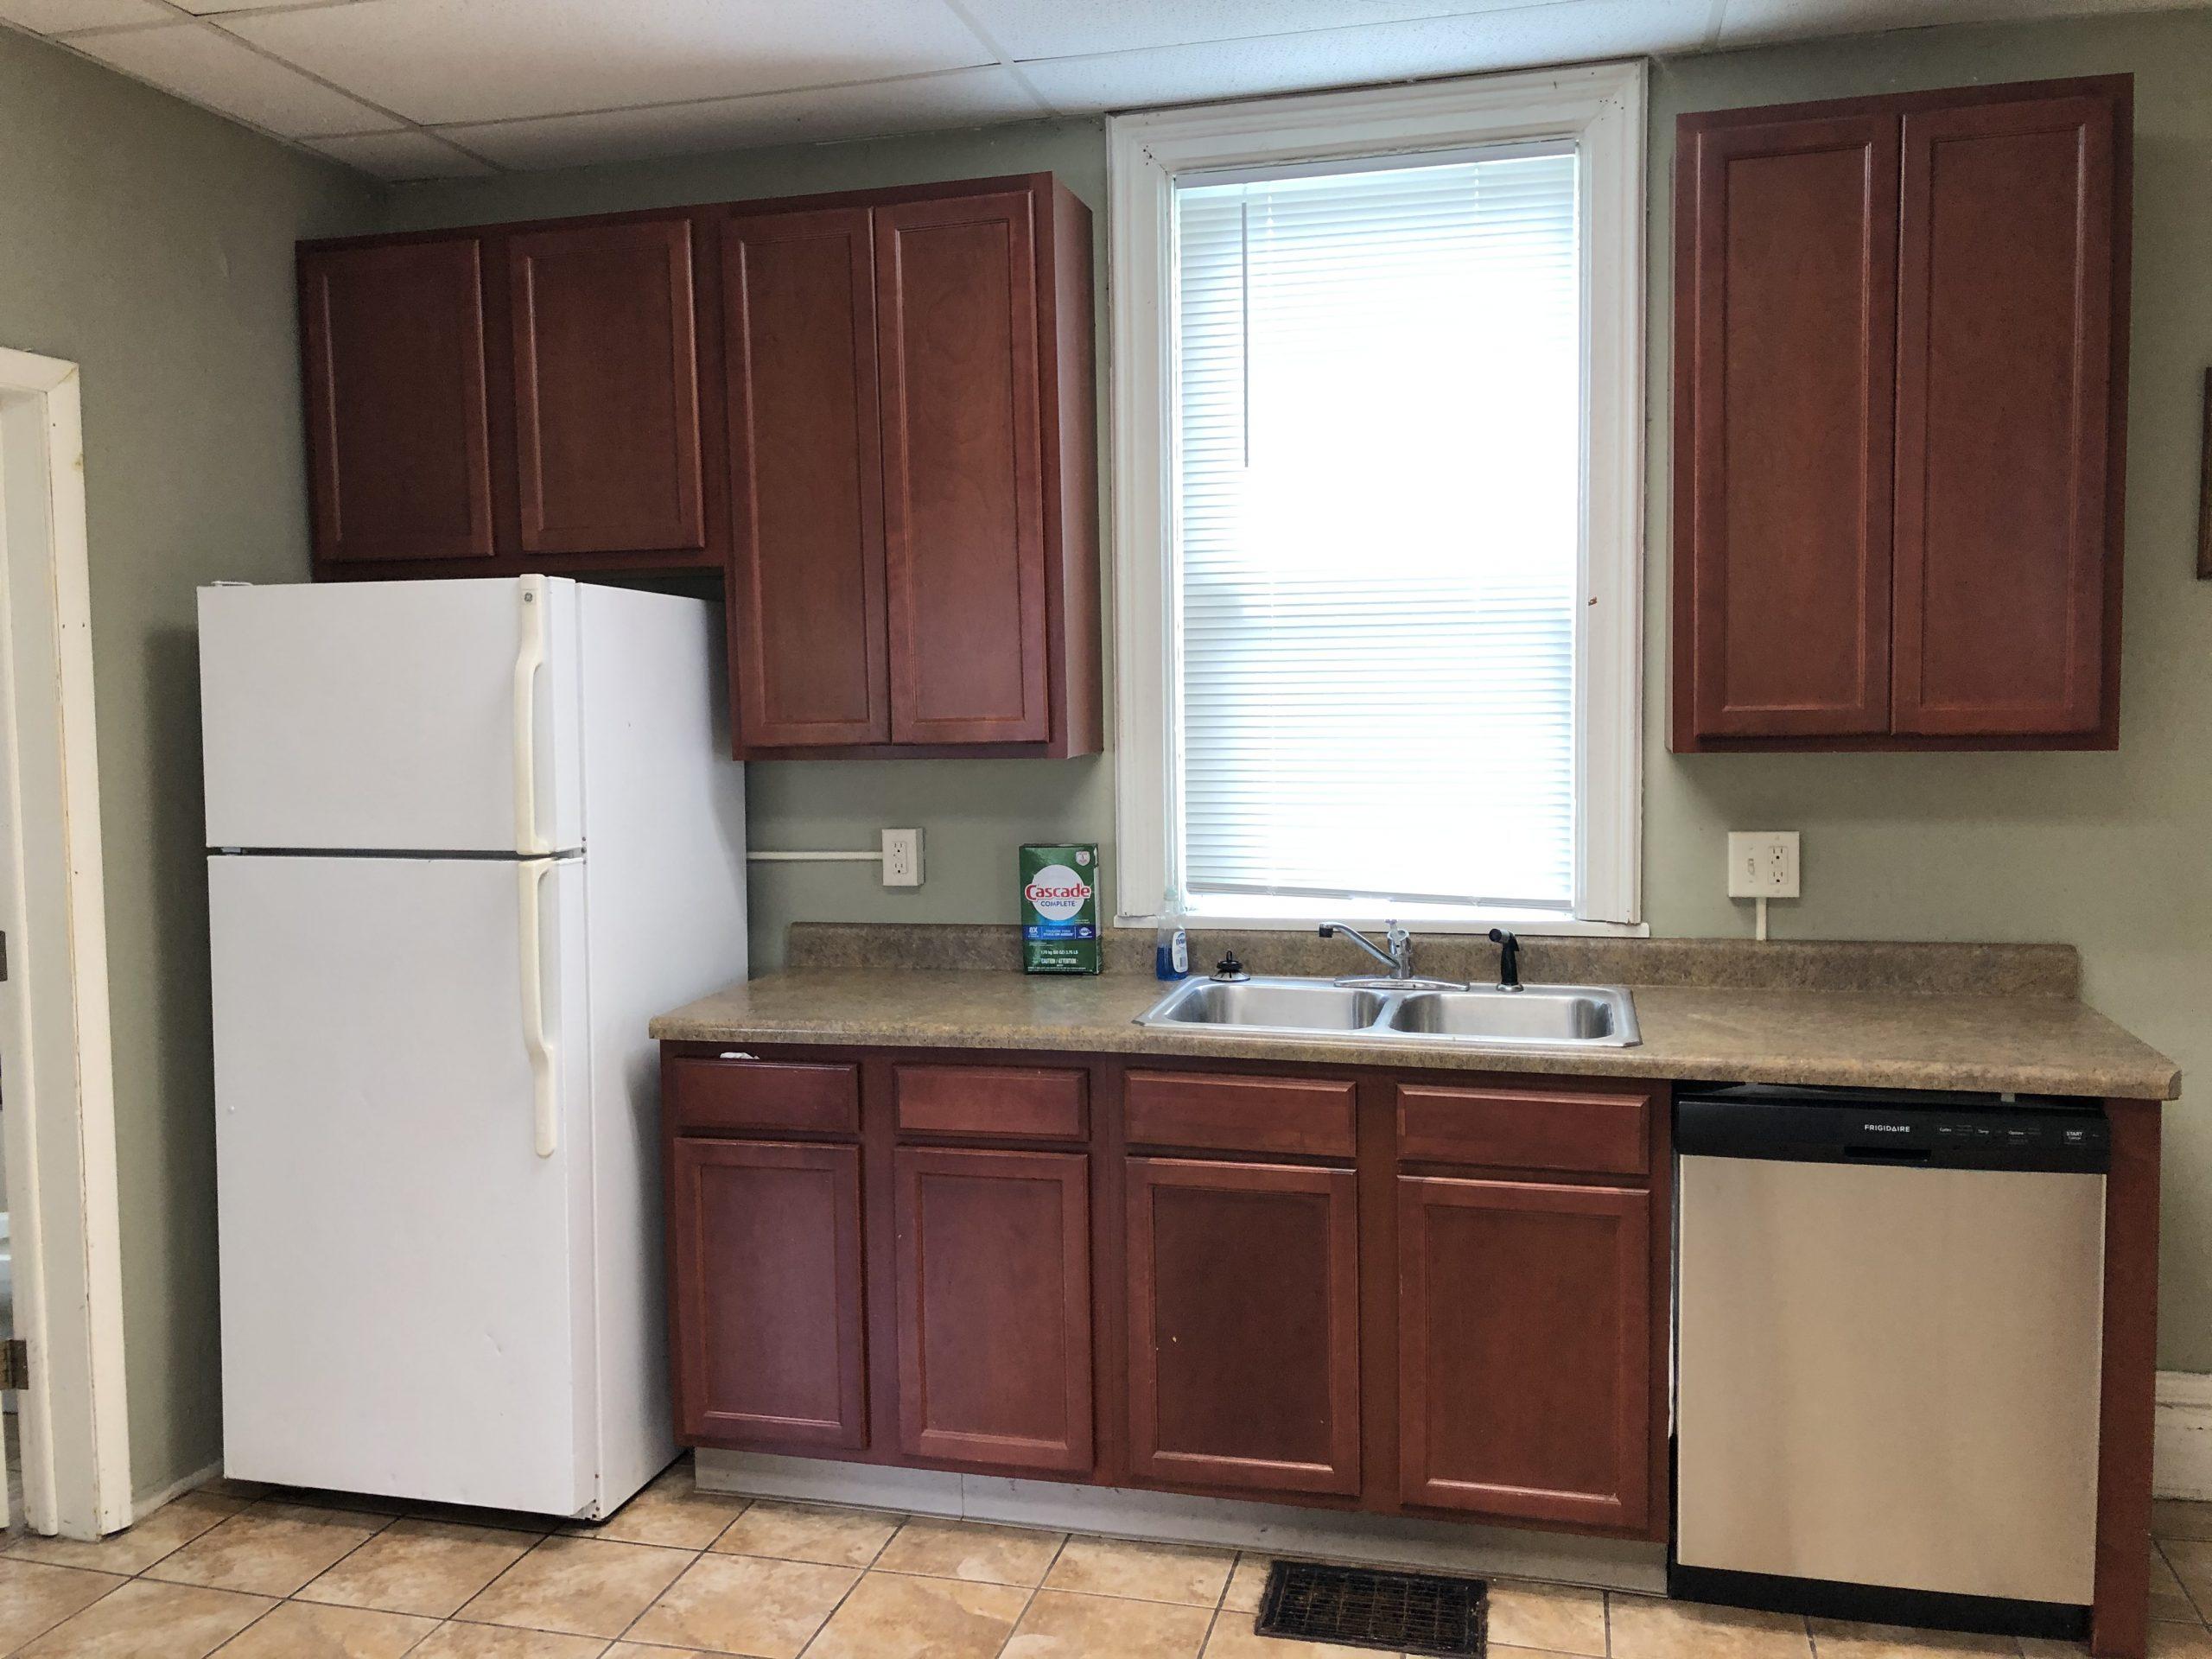 kitchen2_604-clinton_iowa-city_j-and-j-apartments